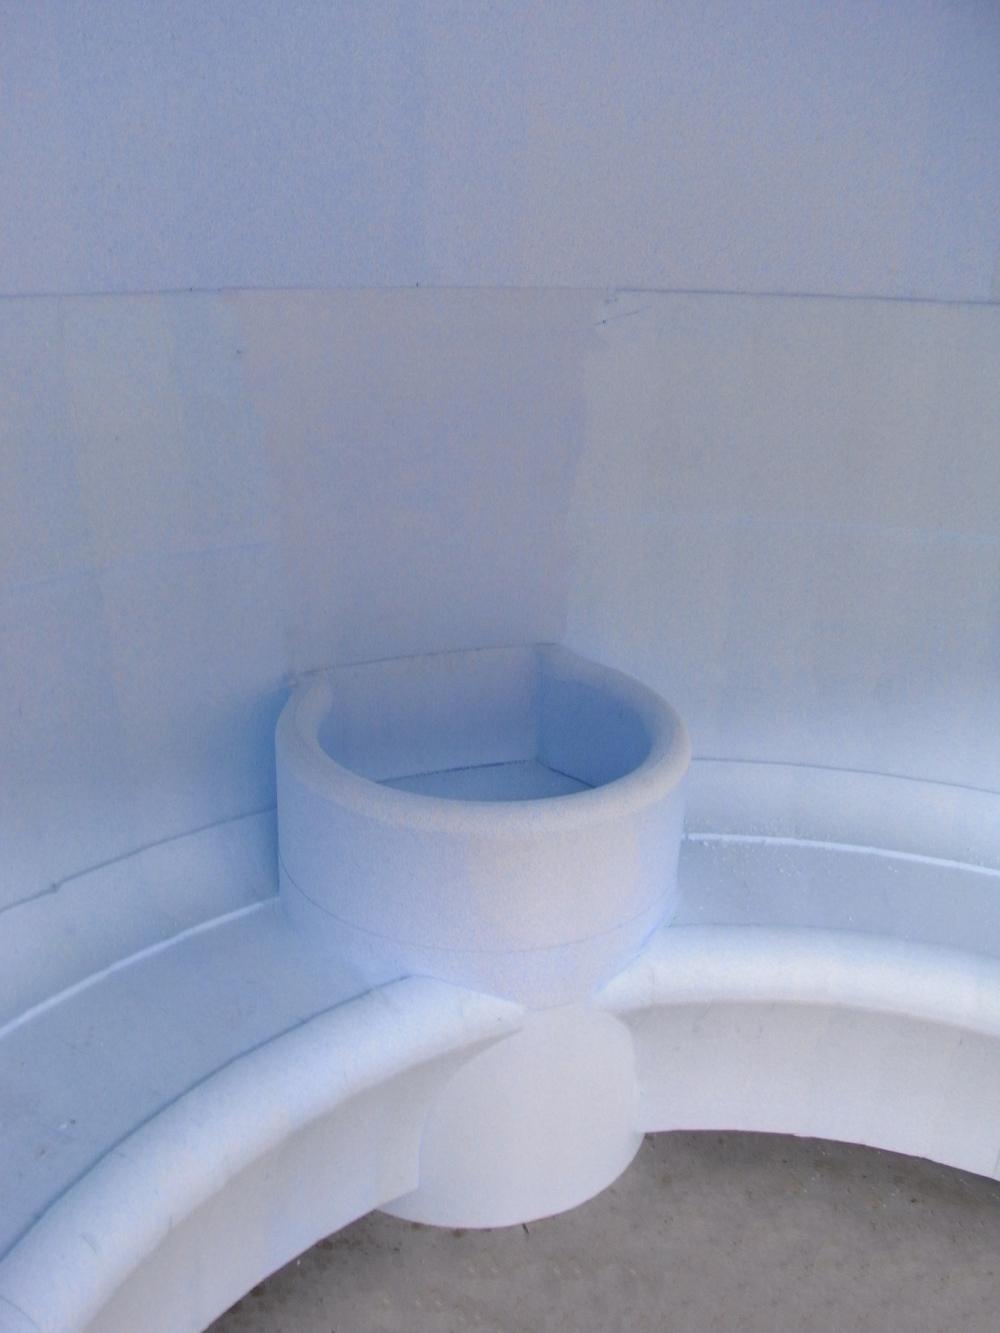 Esempio di Fontana per Bagno Turco //Example of Turkish Bath Fountain